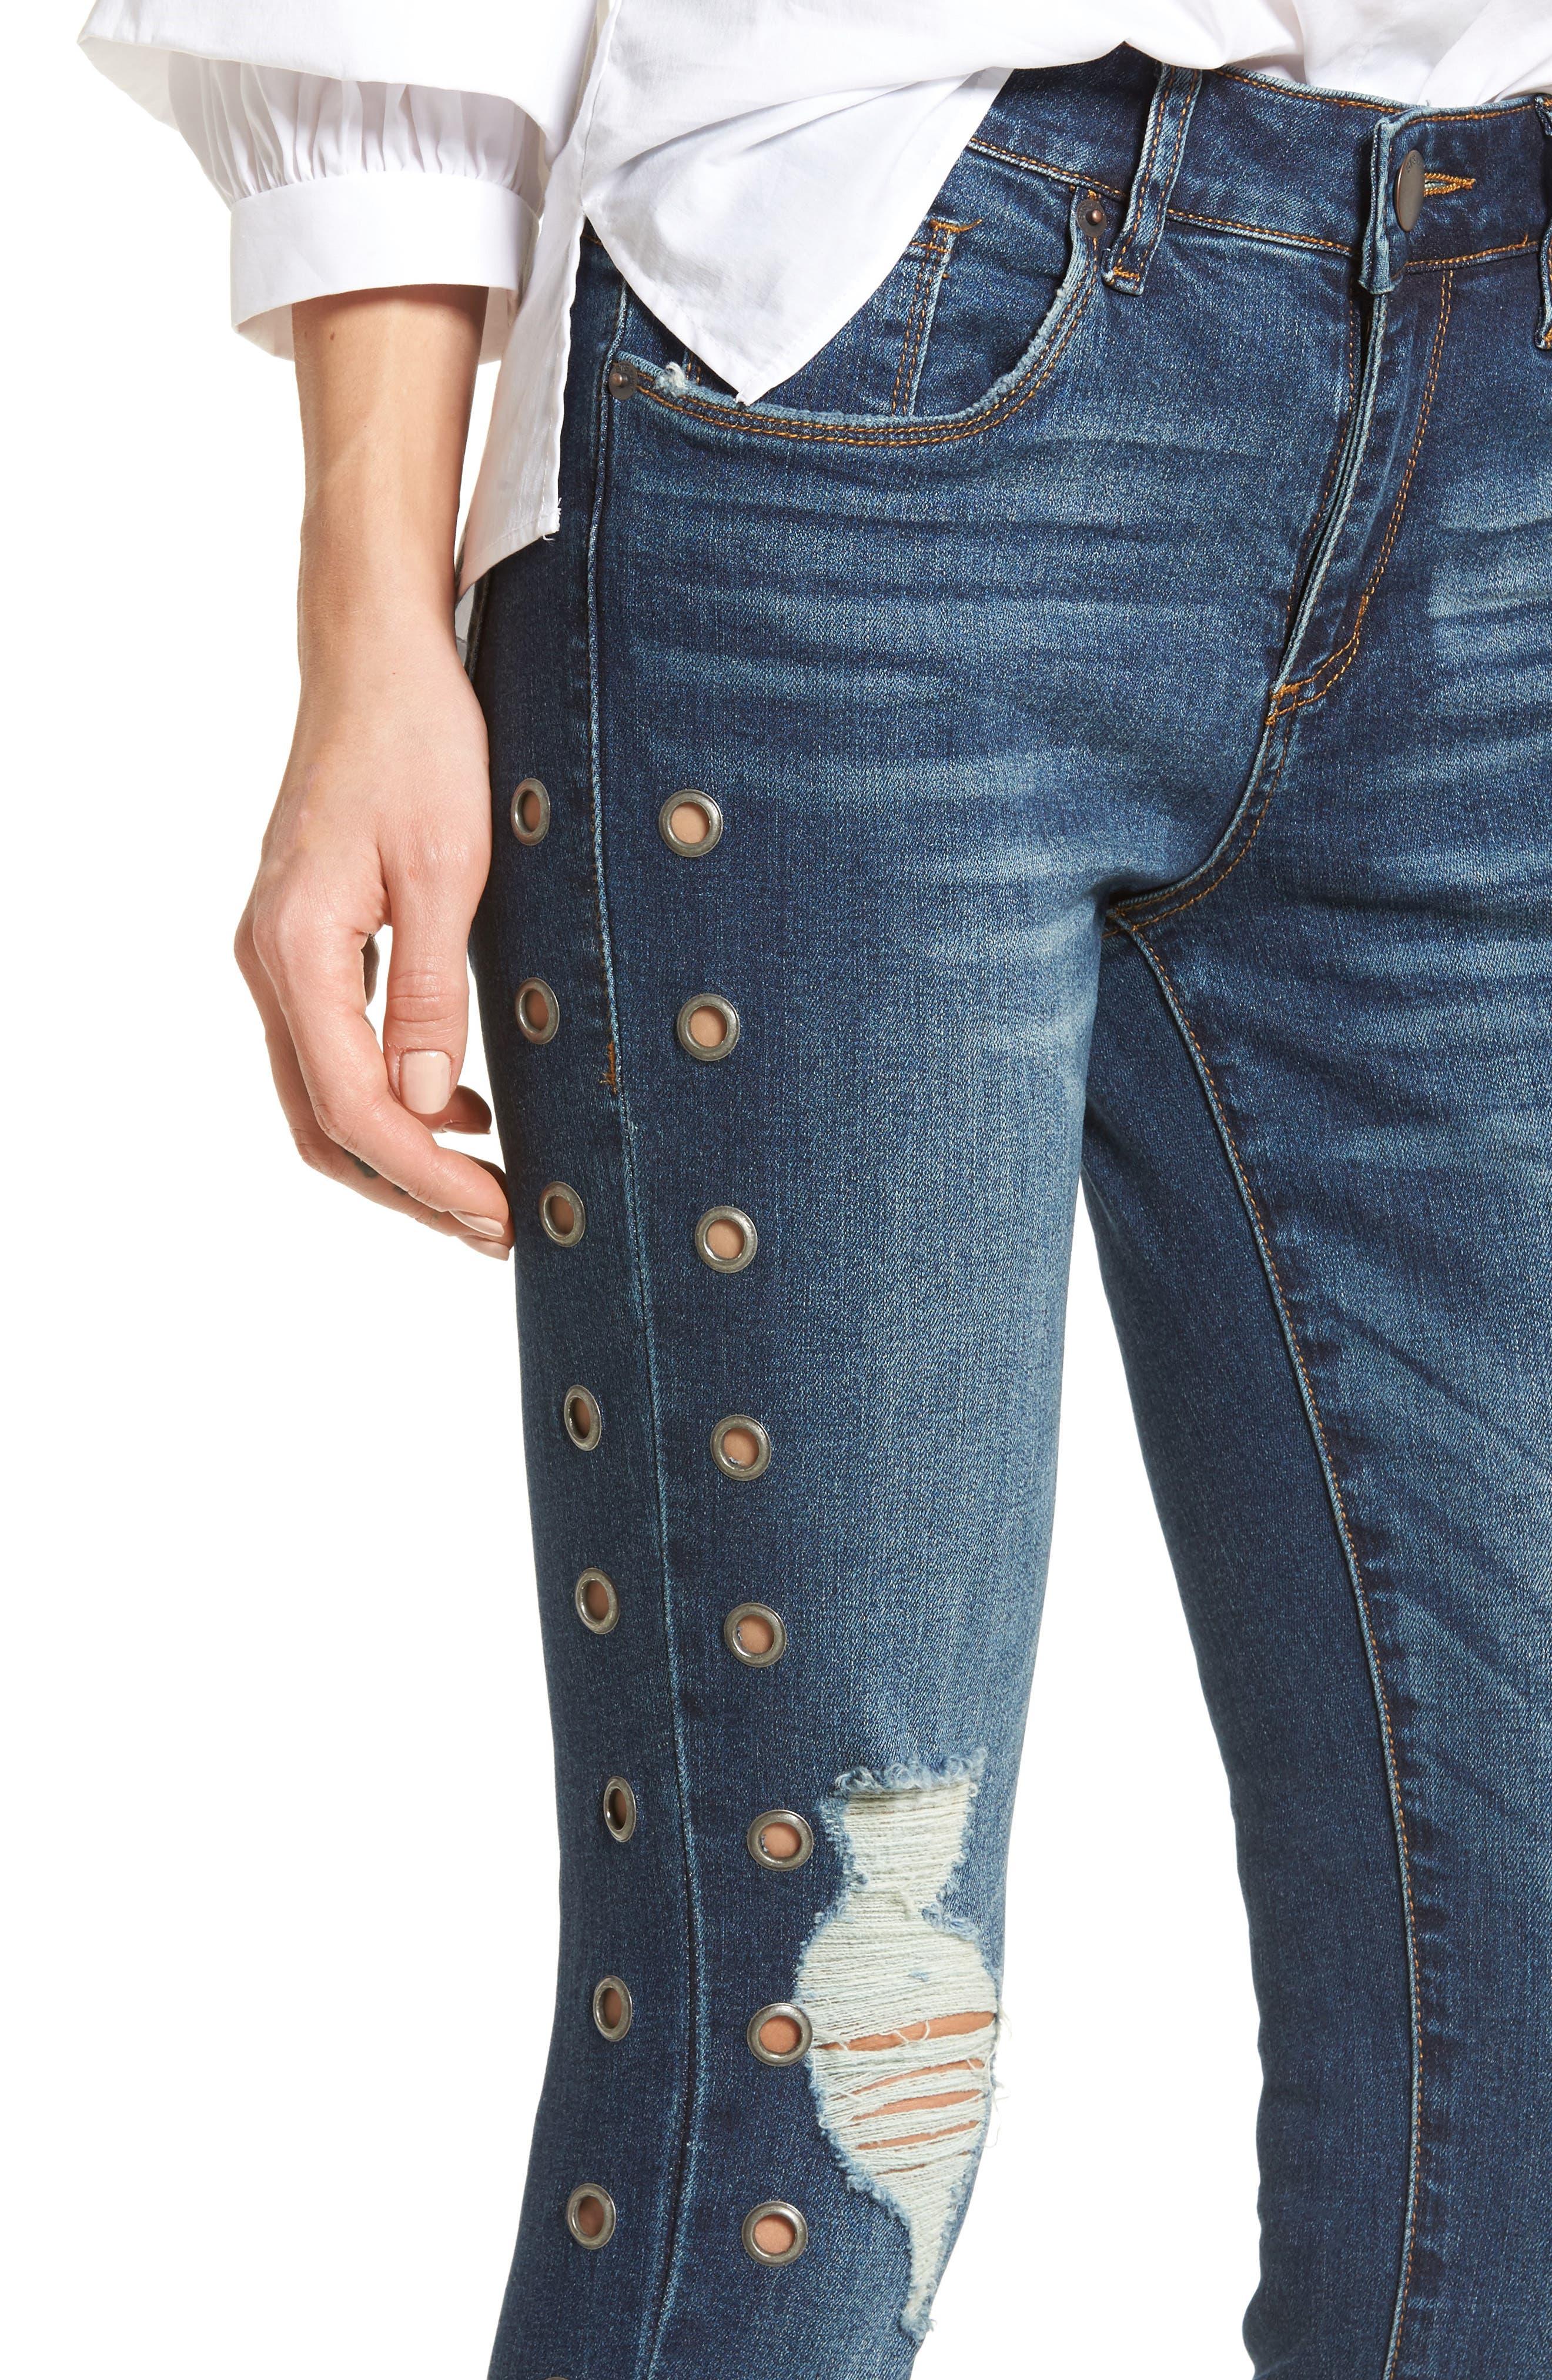 Piper Grommet Detail Skinny Jeans,                             Alternate thumbnail 4, color,                             Westgate